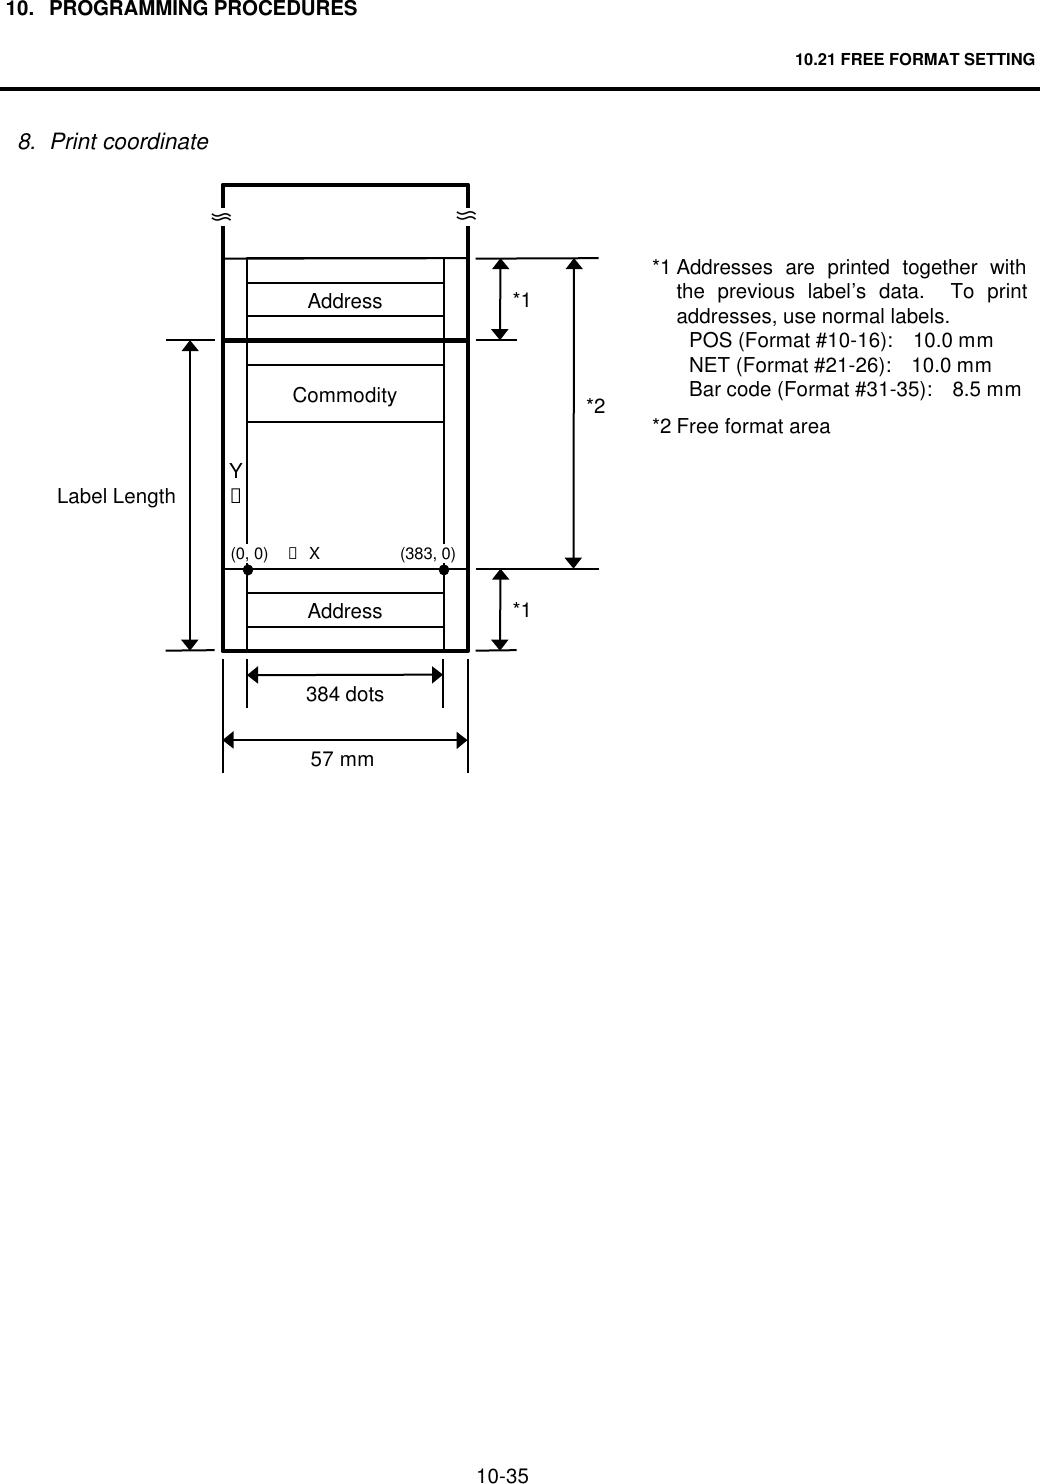 Toshiba Tec Em1 31076 Owners Manual SL 9000 N FFH (EM1 31076E